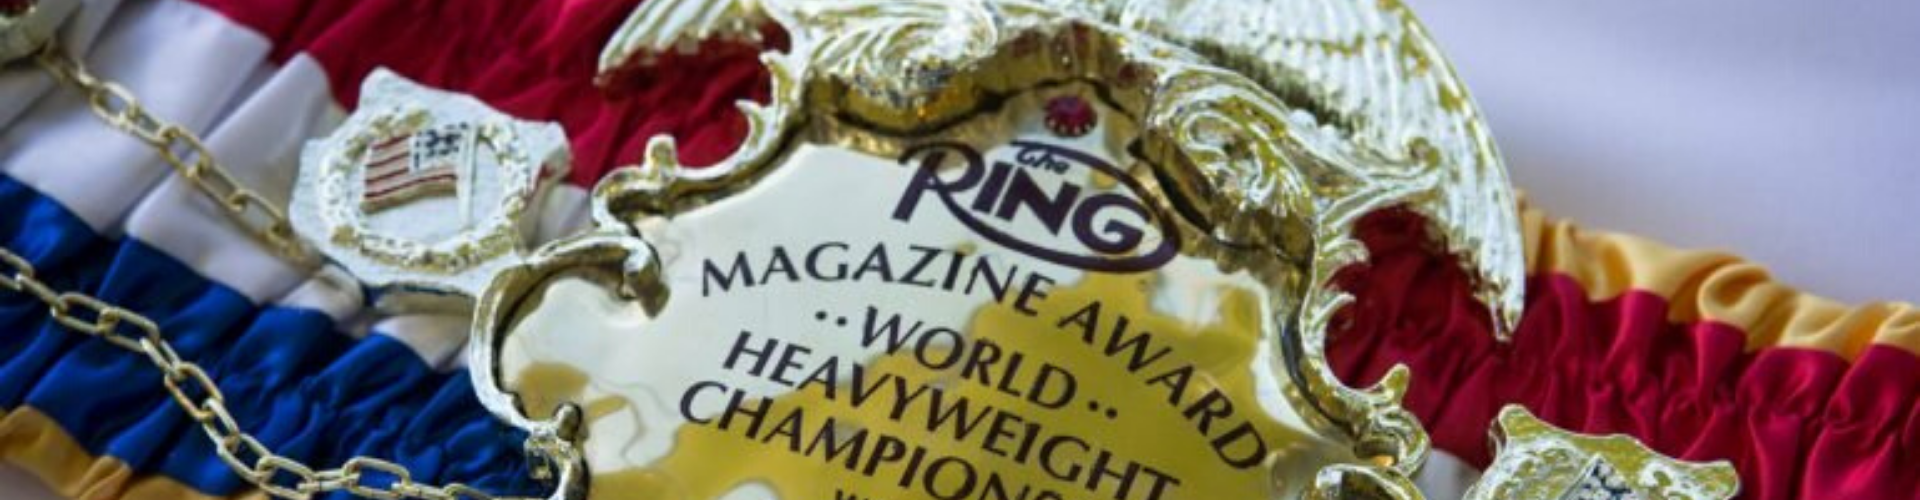 THE RING – Heavyweight Rankings